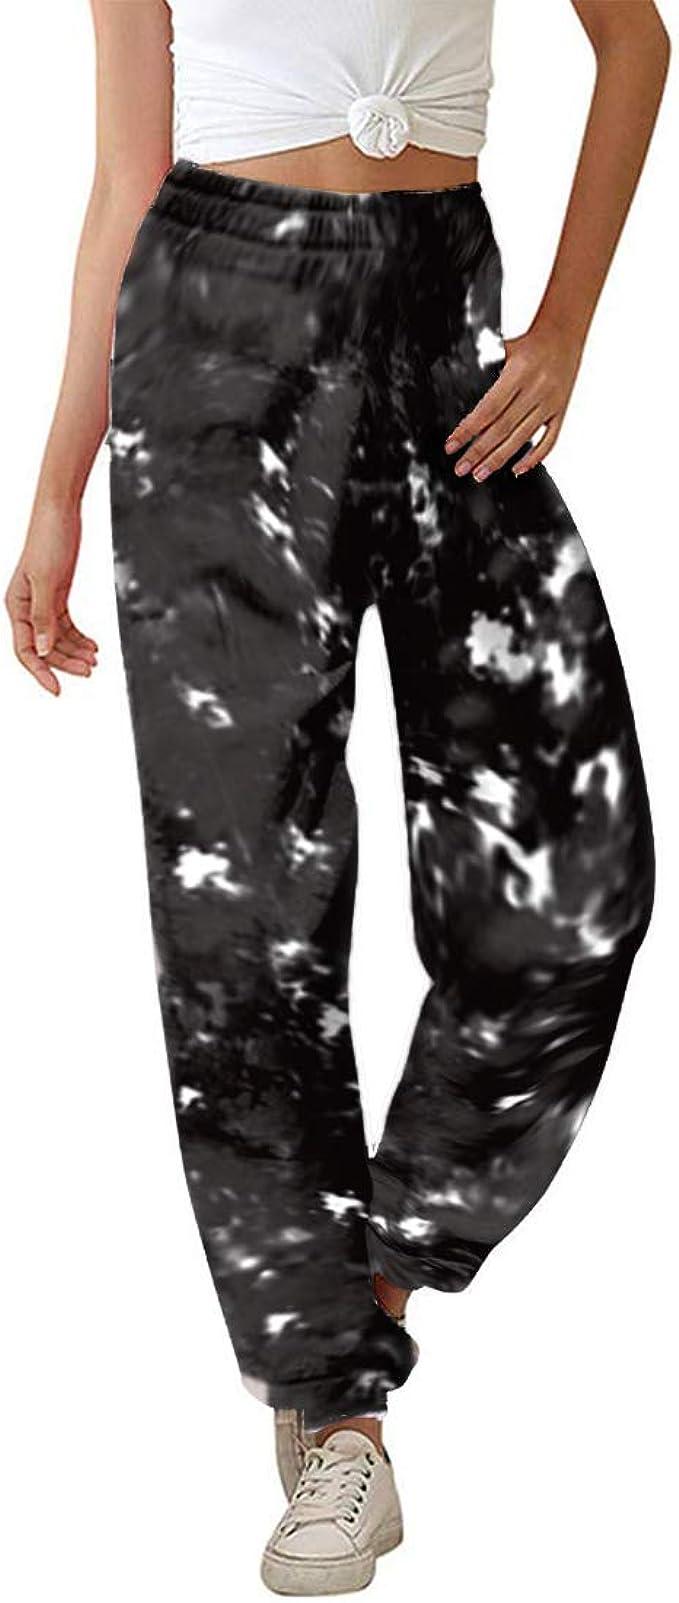 Freizeithosen Hohe Taile Sweathose Pyjamahose aus Baumwolle KOJOOIN Damen Sporthosen Lange Jogginghose Loose Fit Trainingshose mit Taschen und Kordelzug